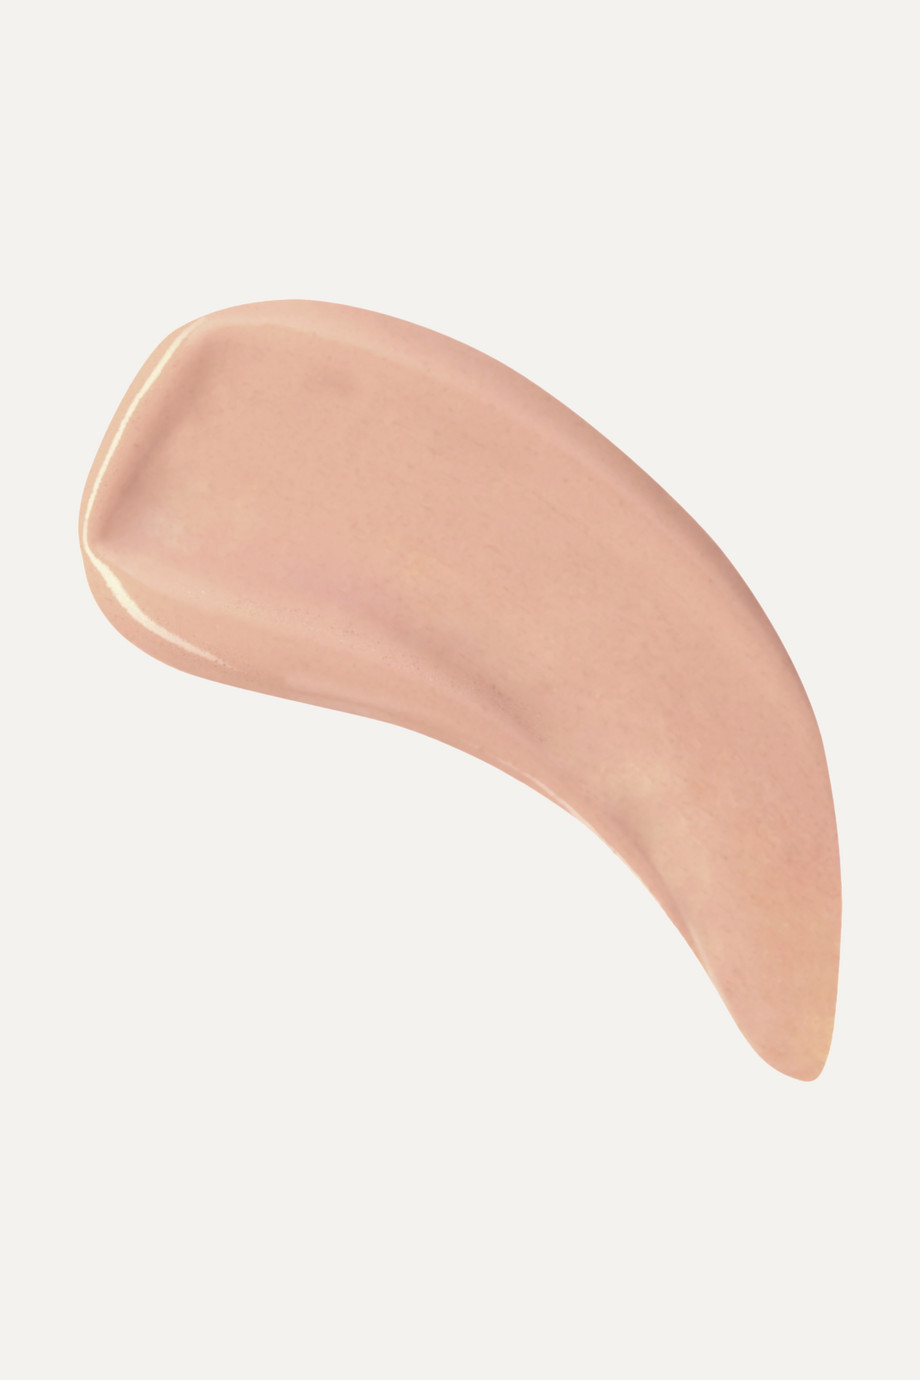 Hourglass Illusion® Hyaluronic Skin Tint SPF15 - Sand, 30ml